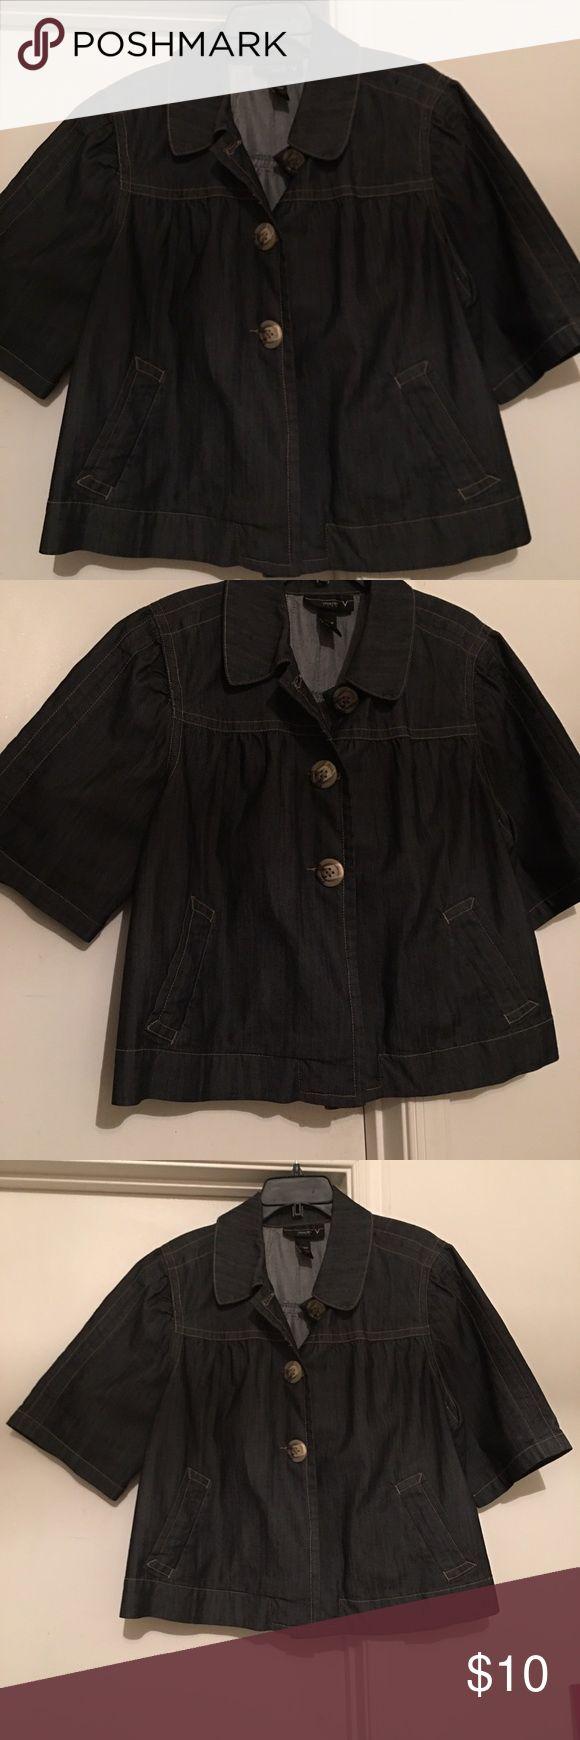 Short Sleeve Jean Jacket Gently used short sleeve jean jacket. Size 18/20 Venezia Jackets & Coats Jean Jackets